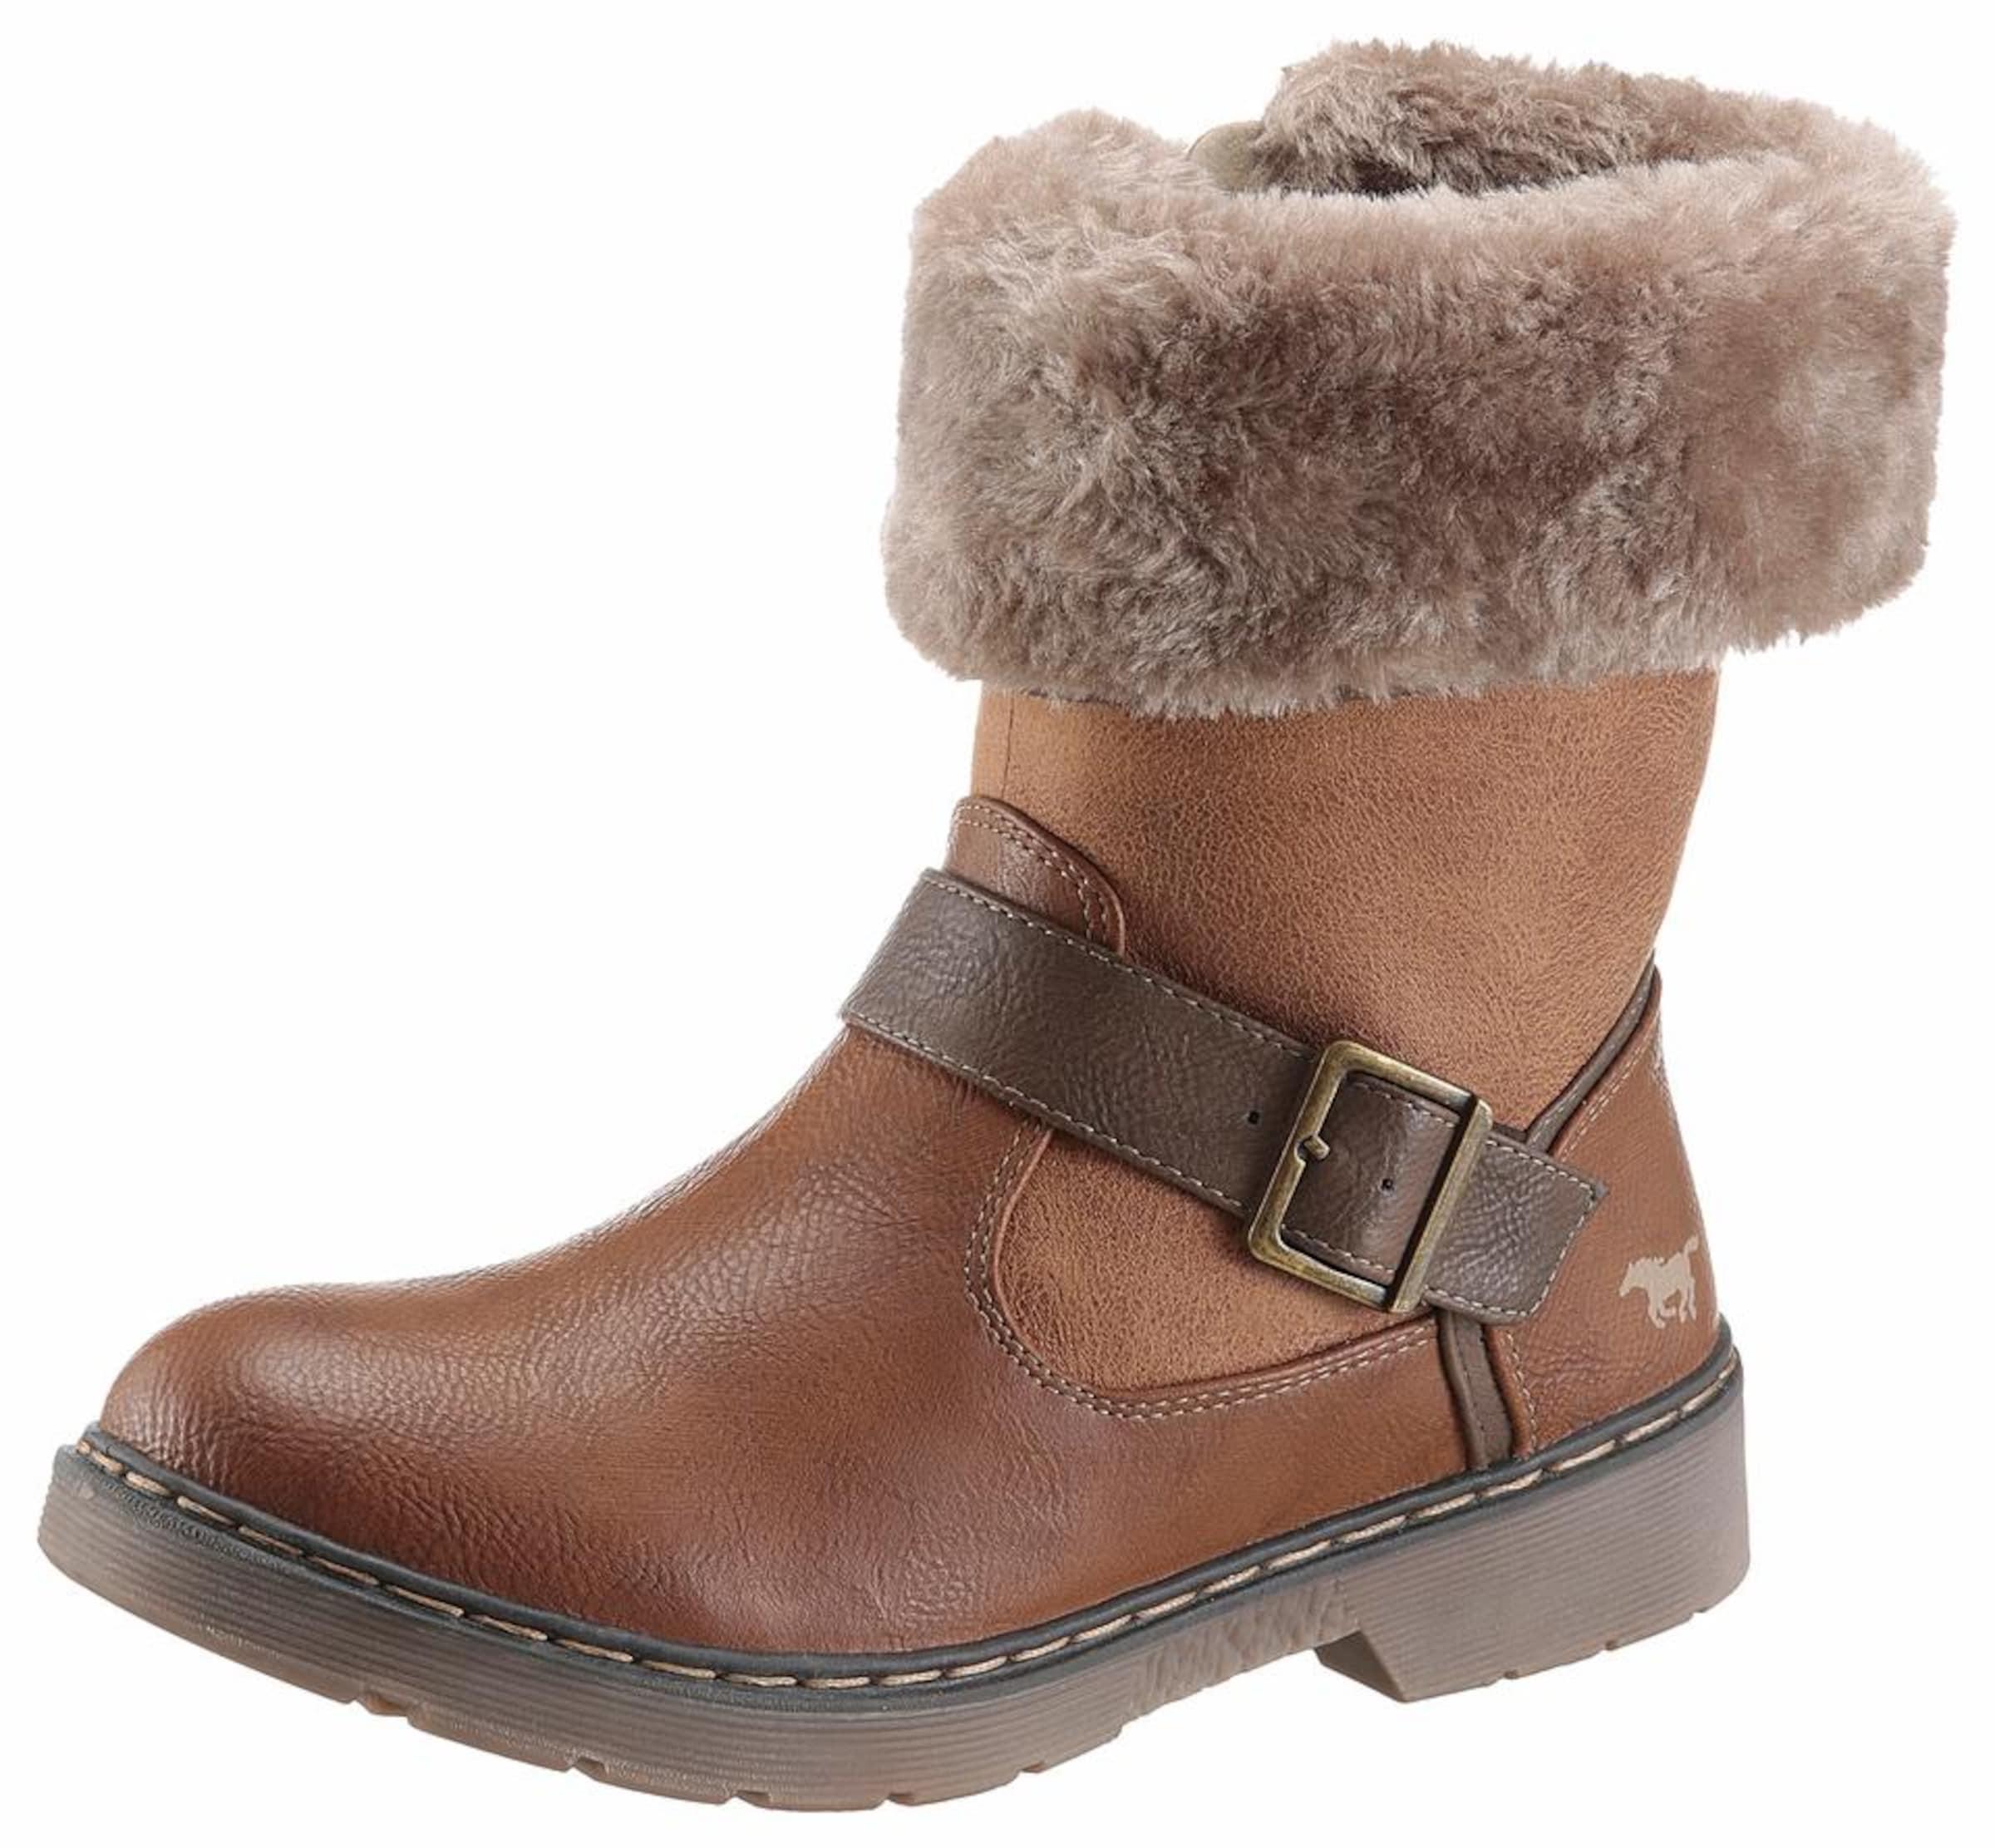 MUSTANG Shoes Winterstiefelette Spielraum Shop Günstig Online l74K4i2bzz